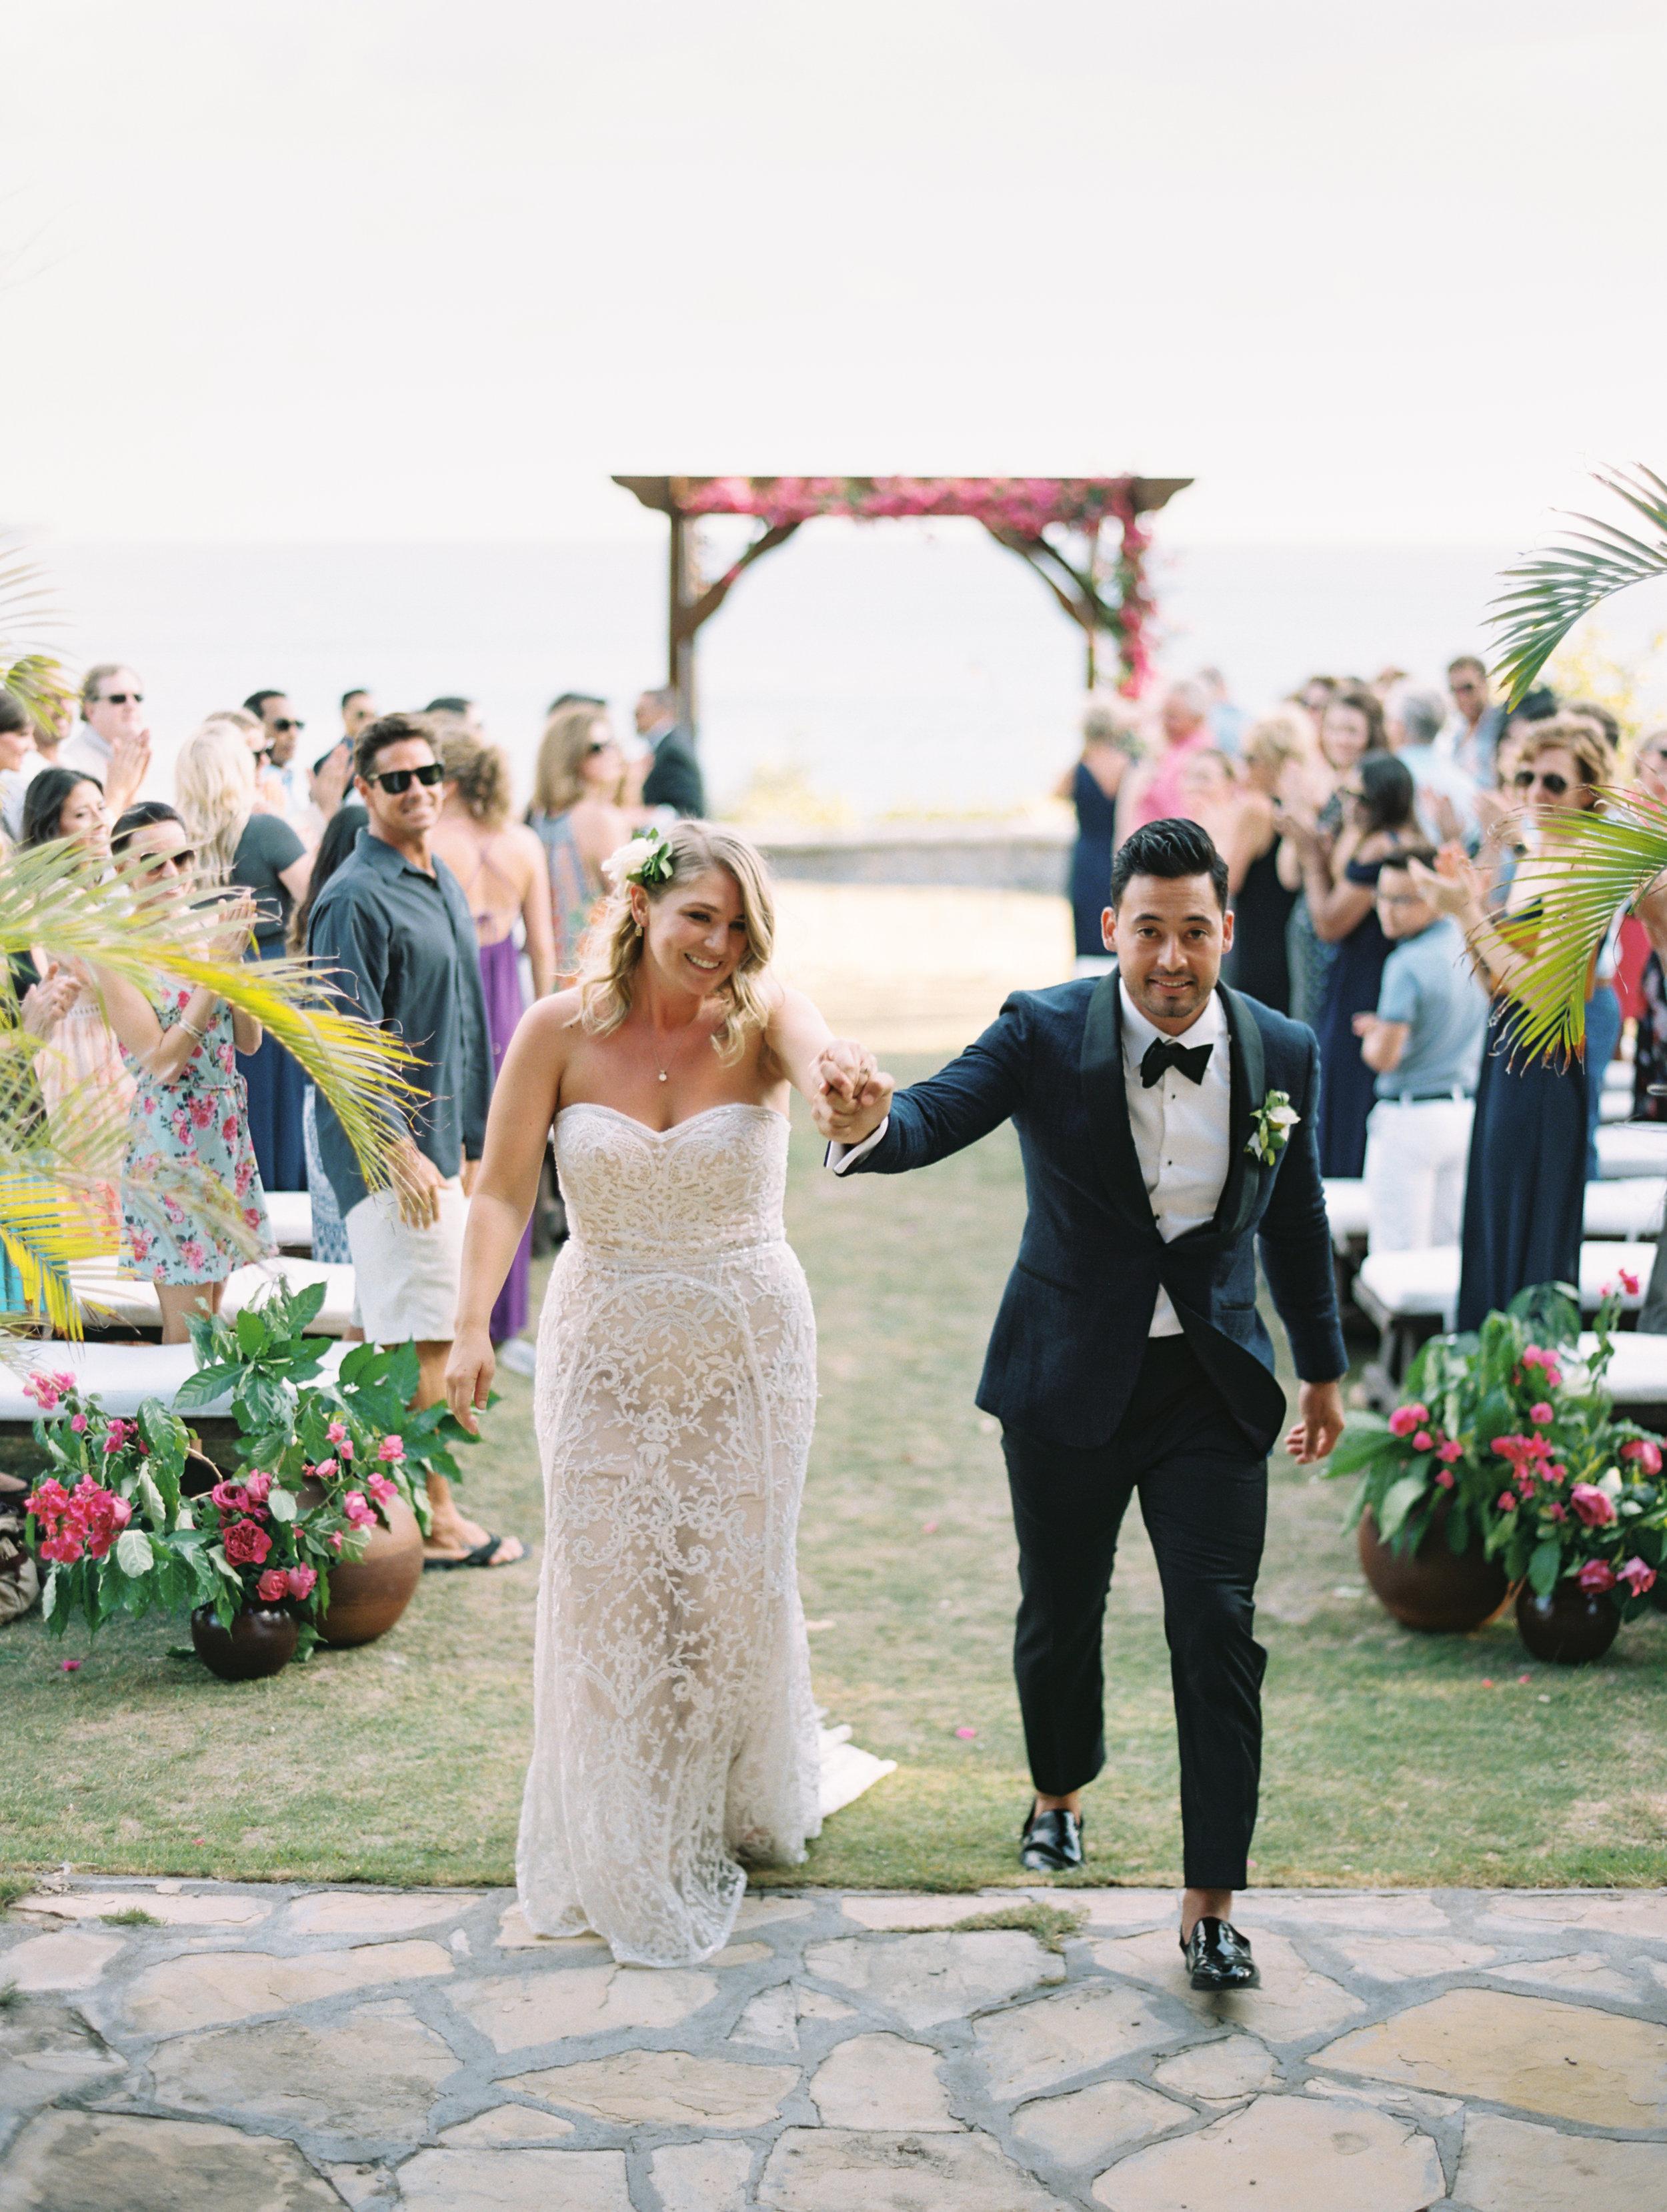 397-fine-art-film-photographer-destination-wedding-nicaragua-jacob+cammye-brumley & wells.jpg